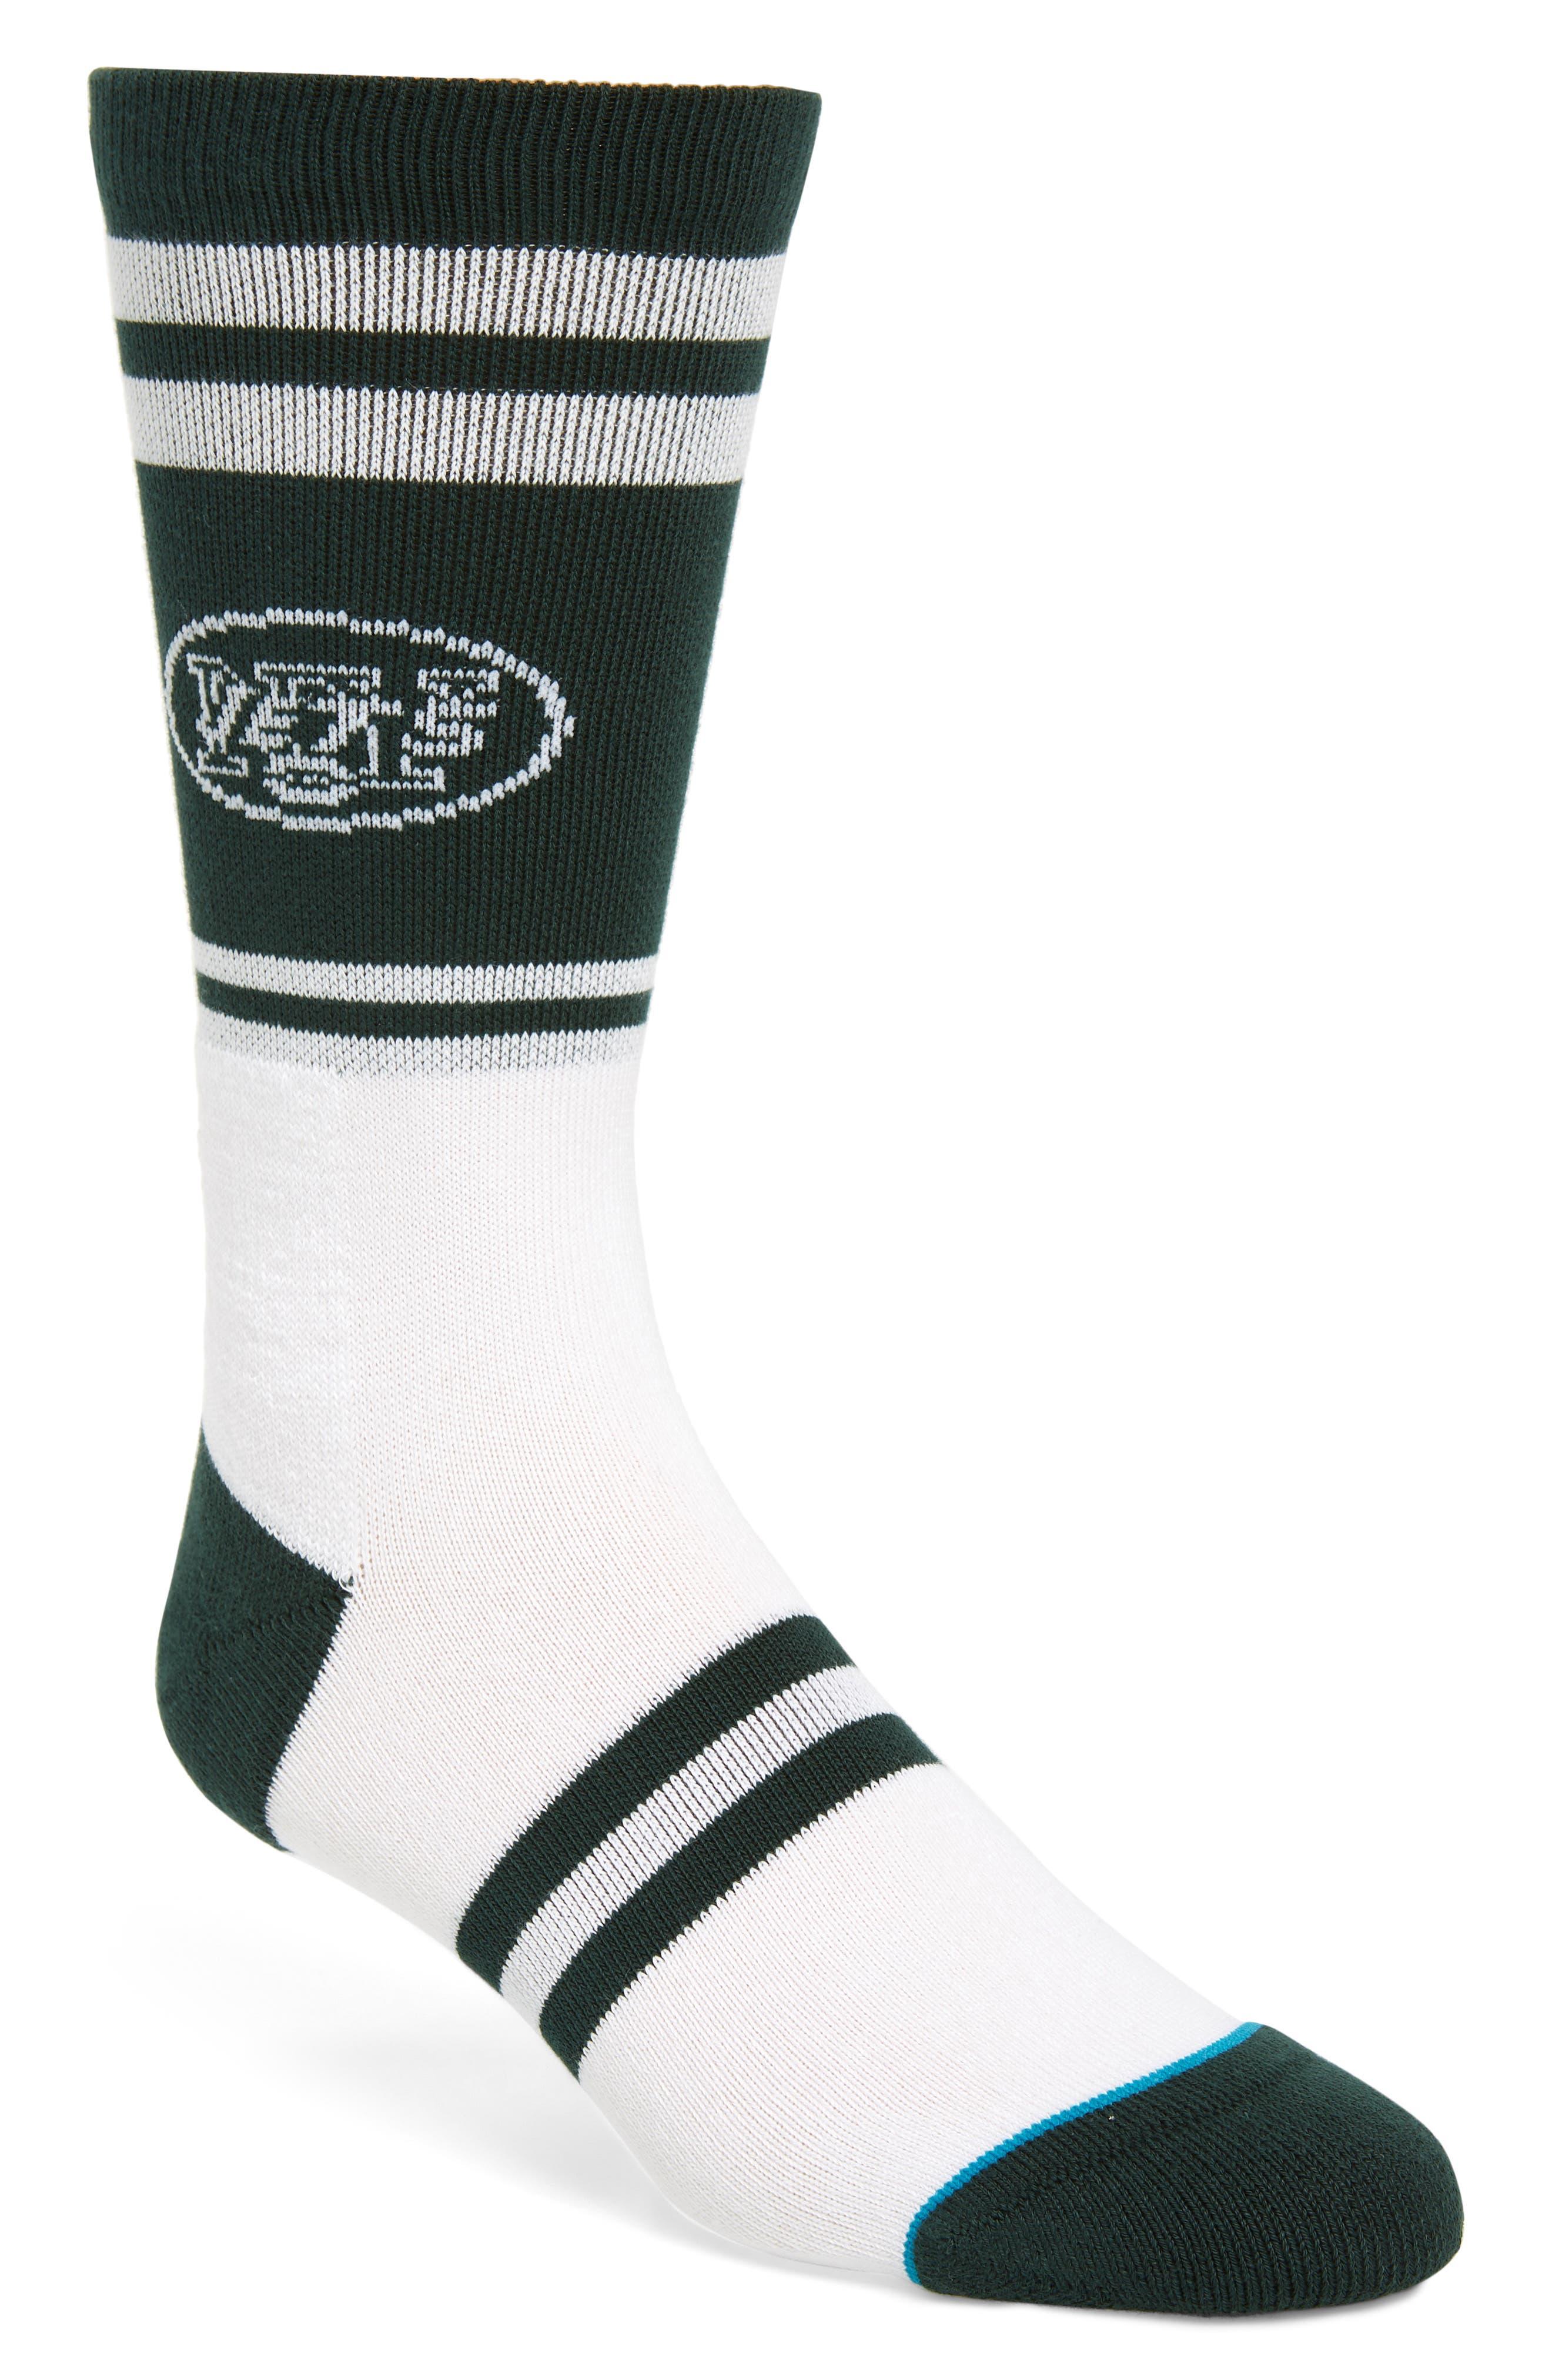 New York Jets Socks,                         Main,                         color, GREEN